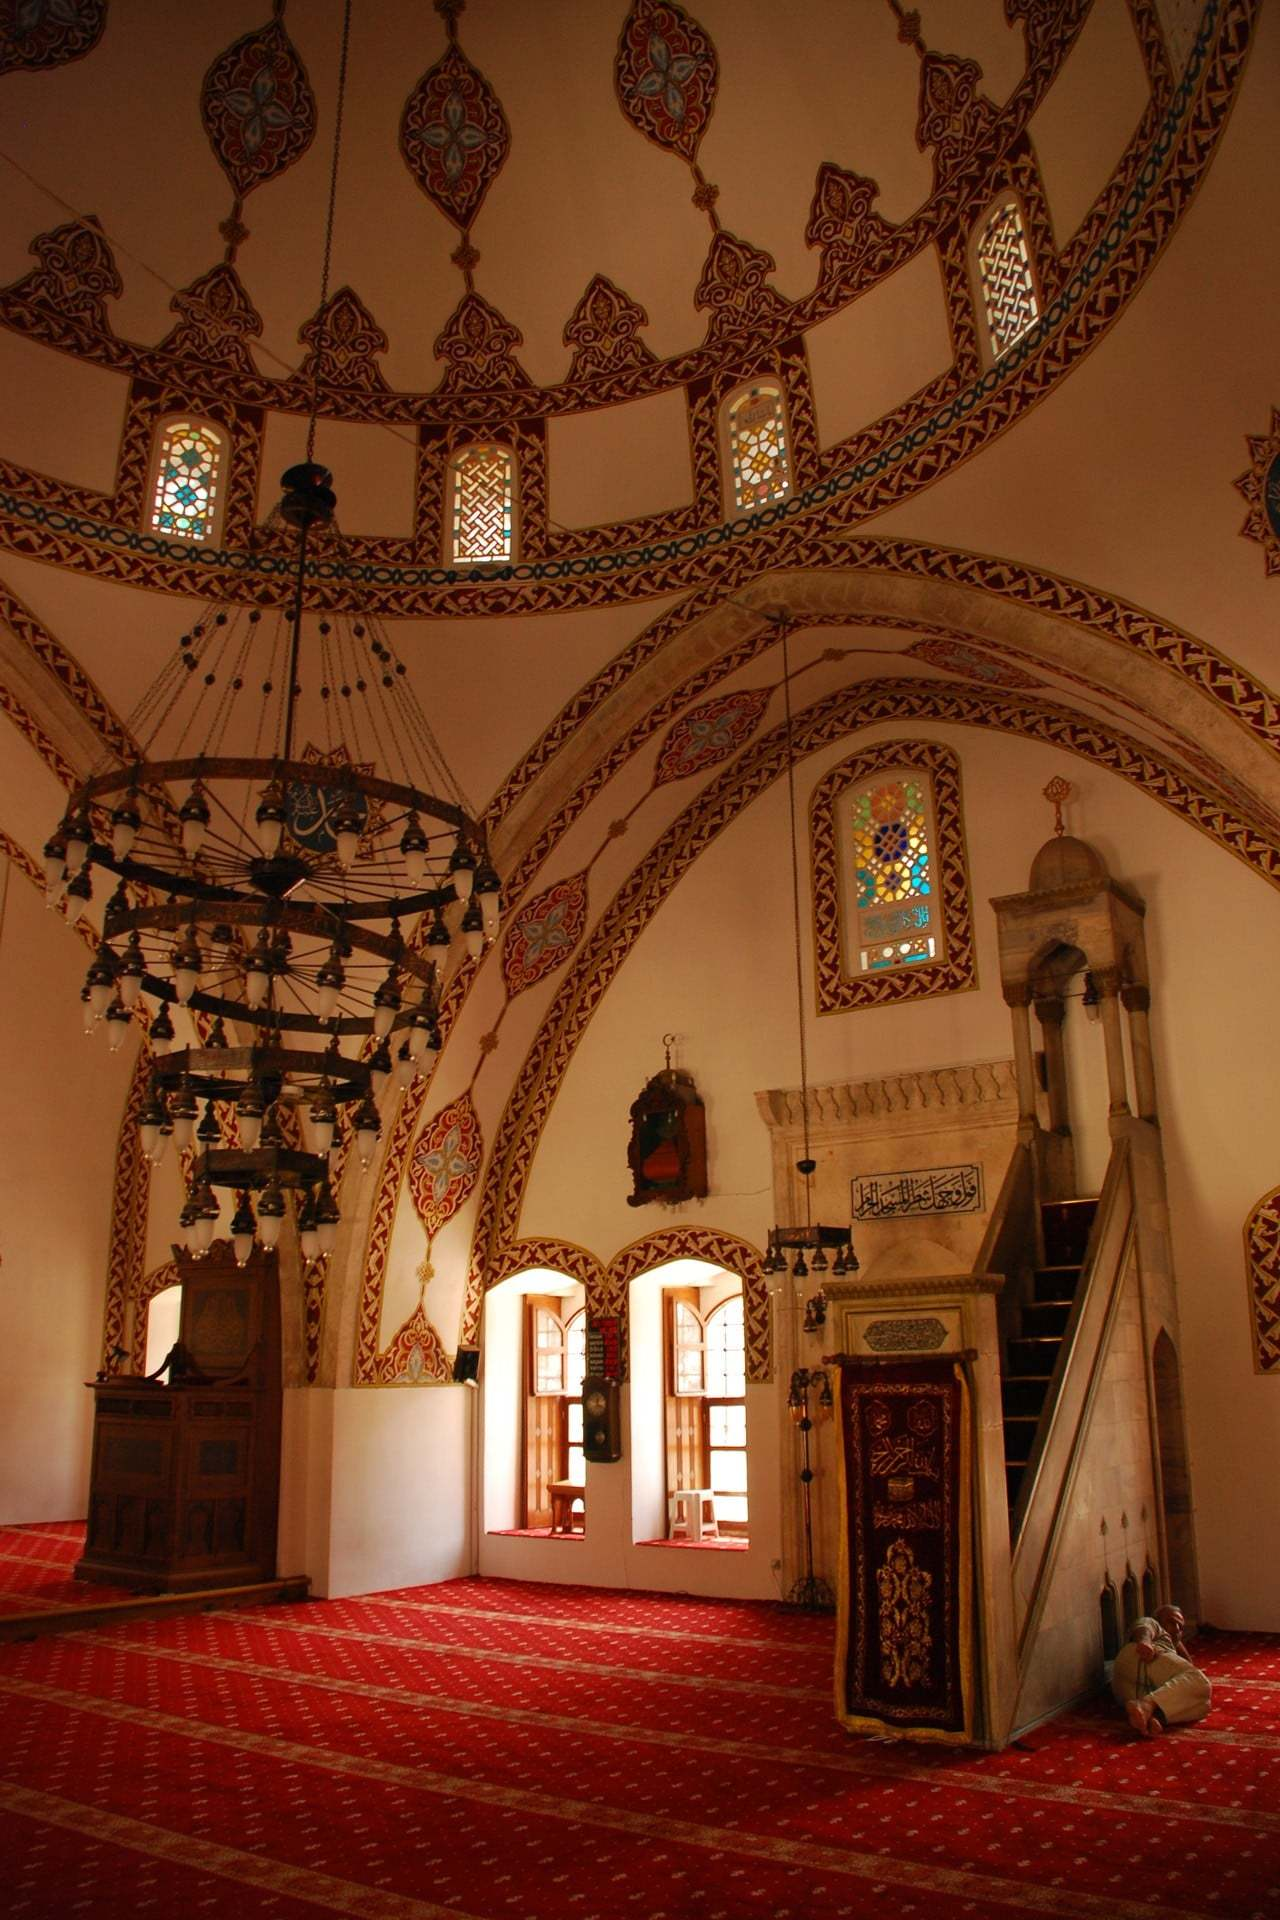 habib-i neccar camii resimleri